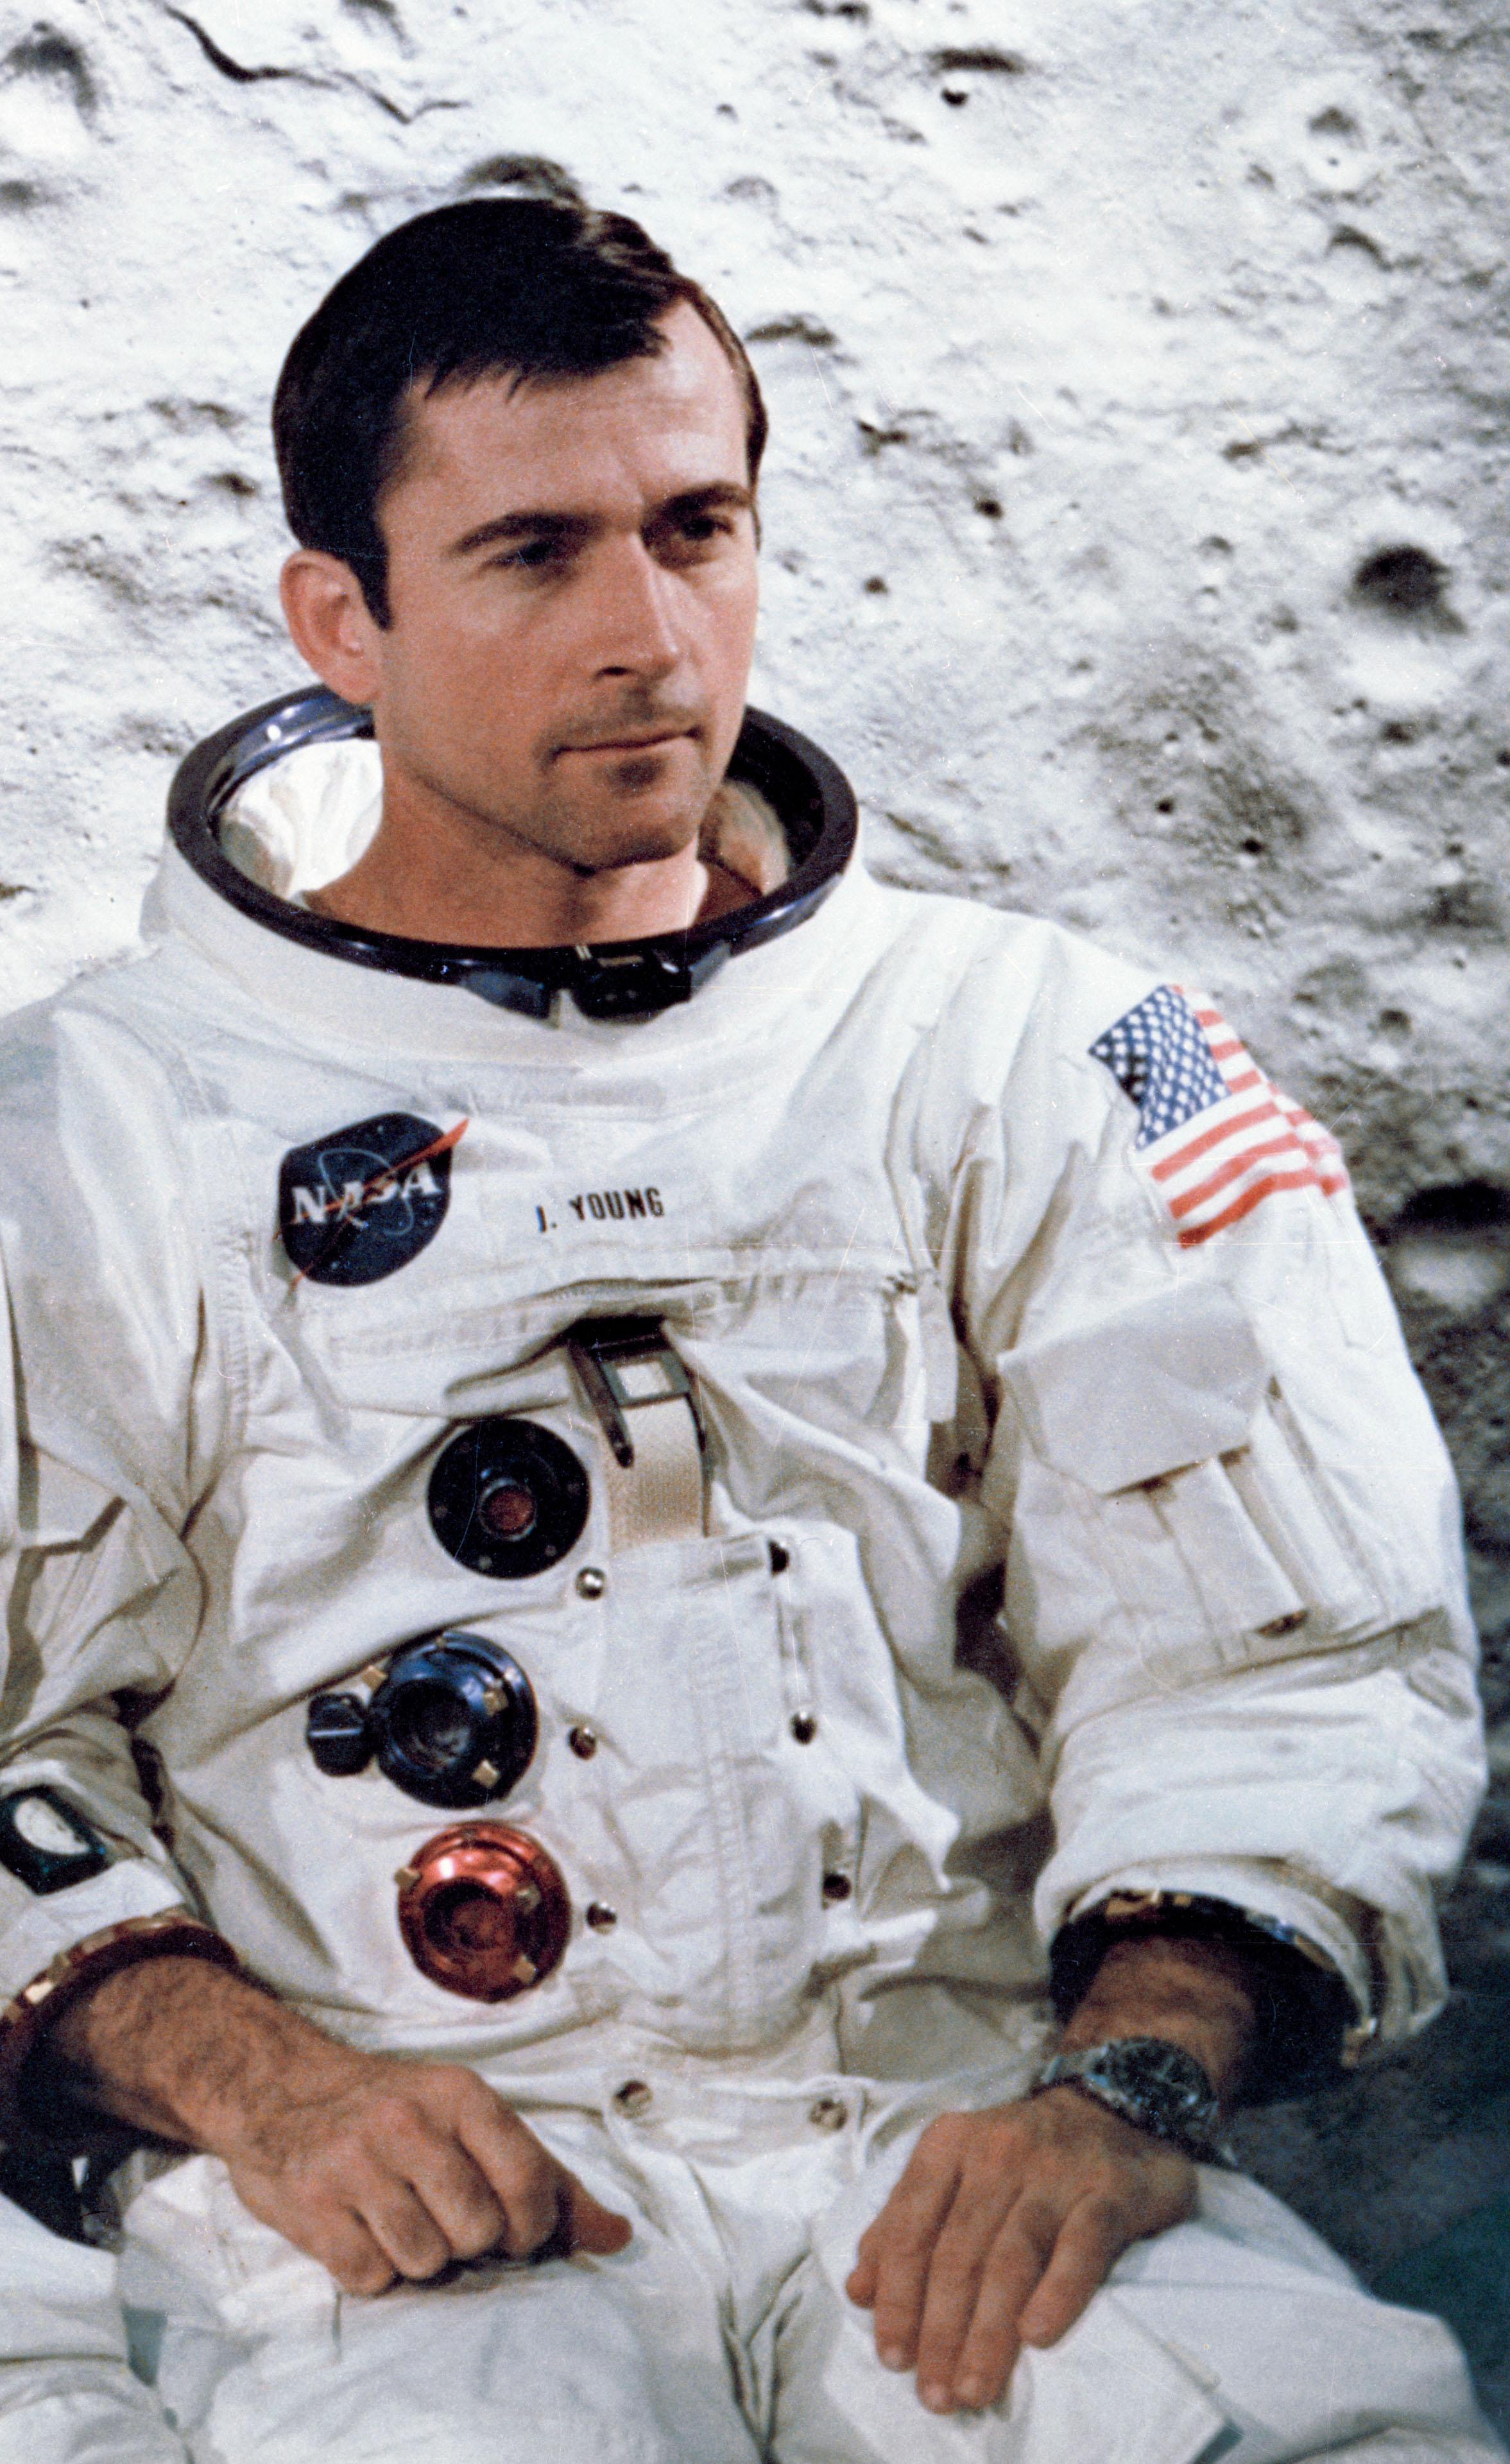 File:John Young (Apollo 10).jpg